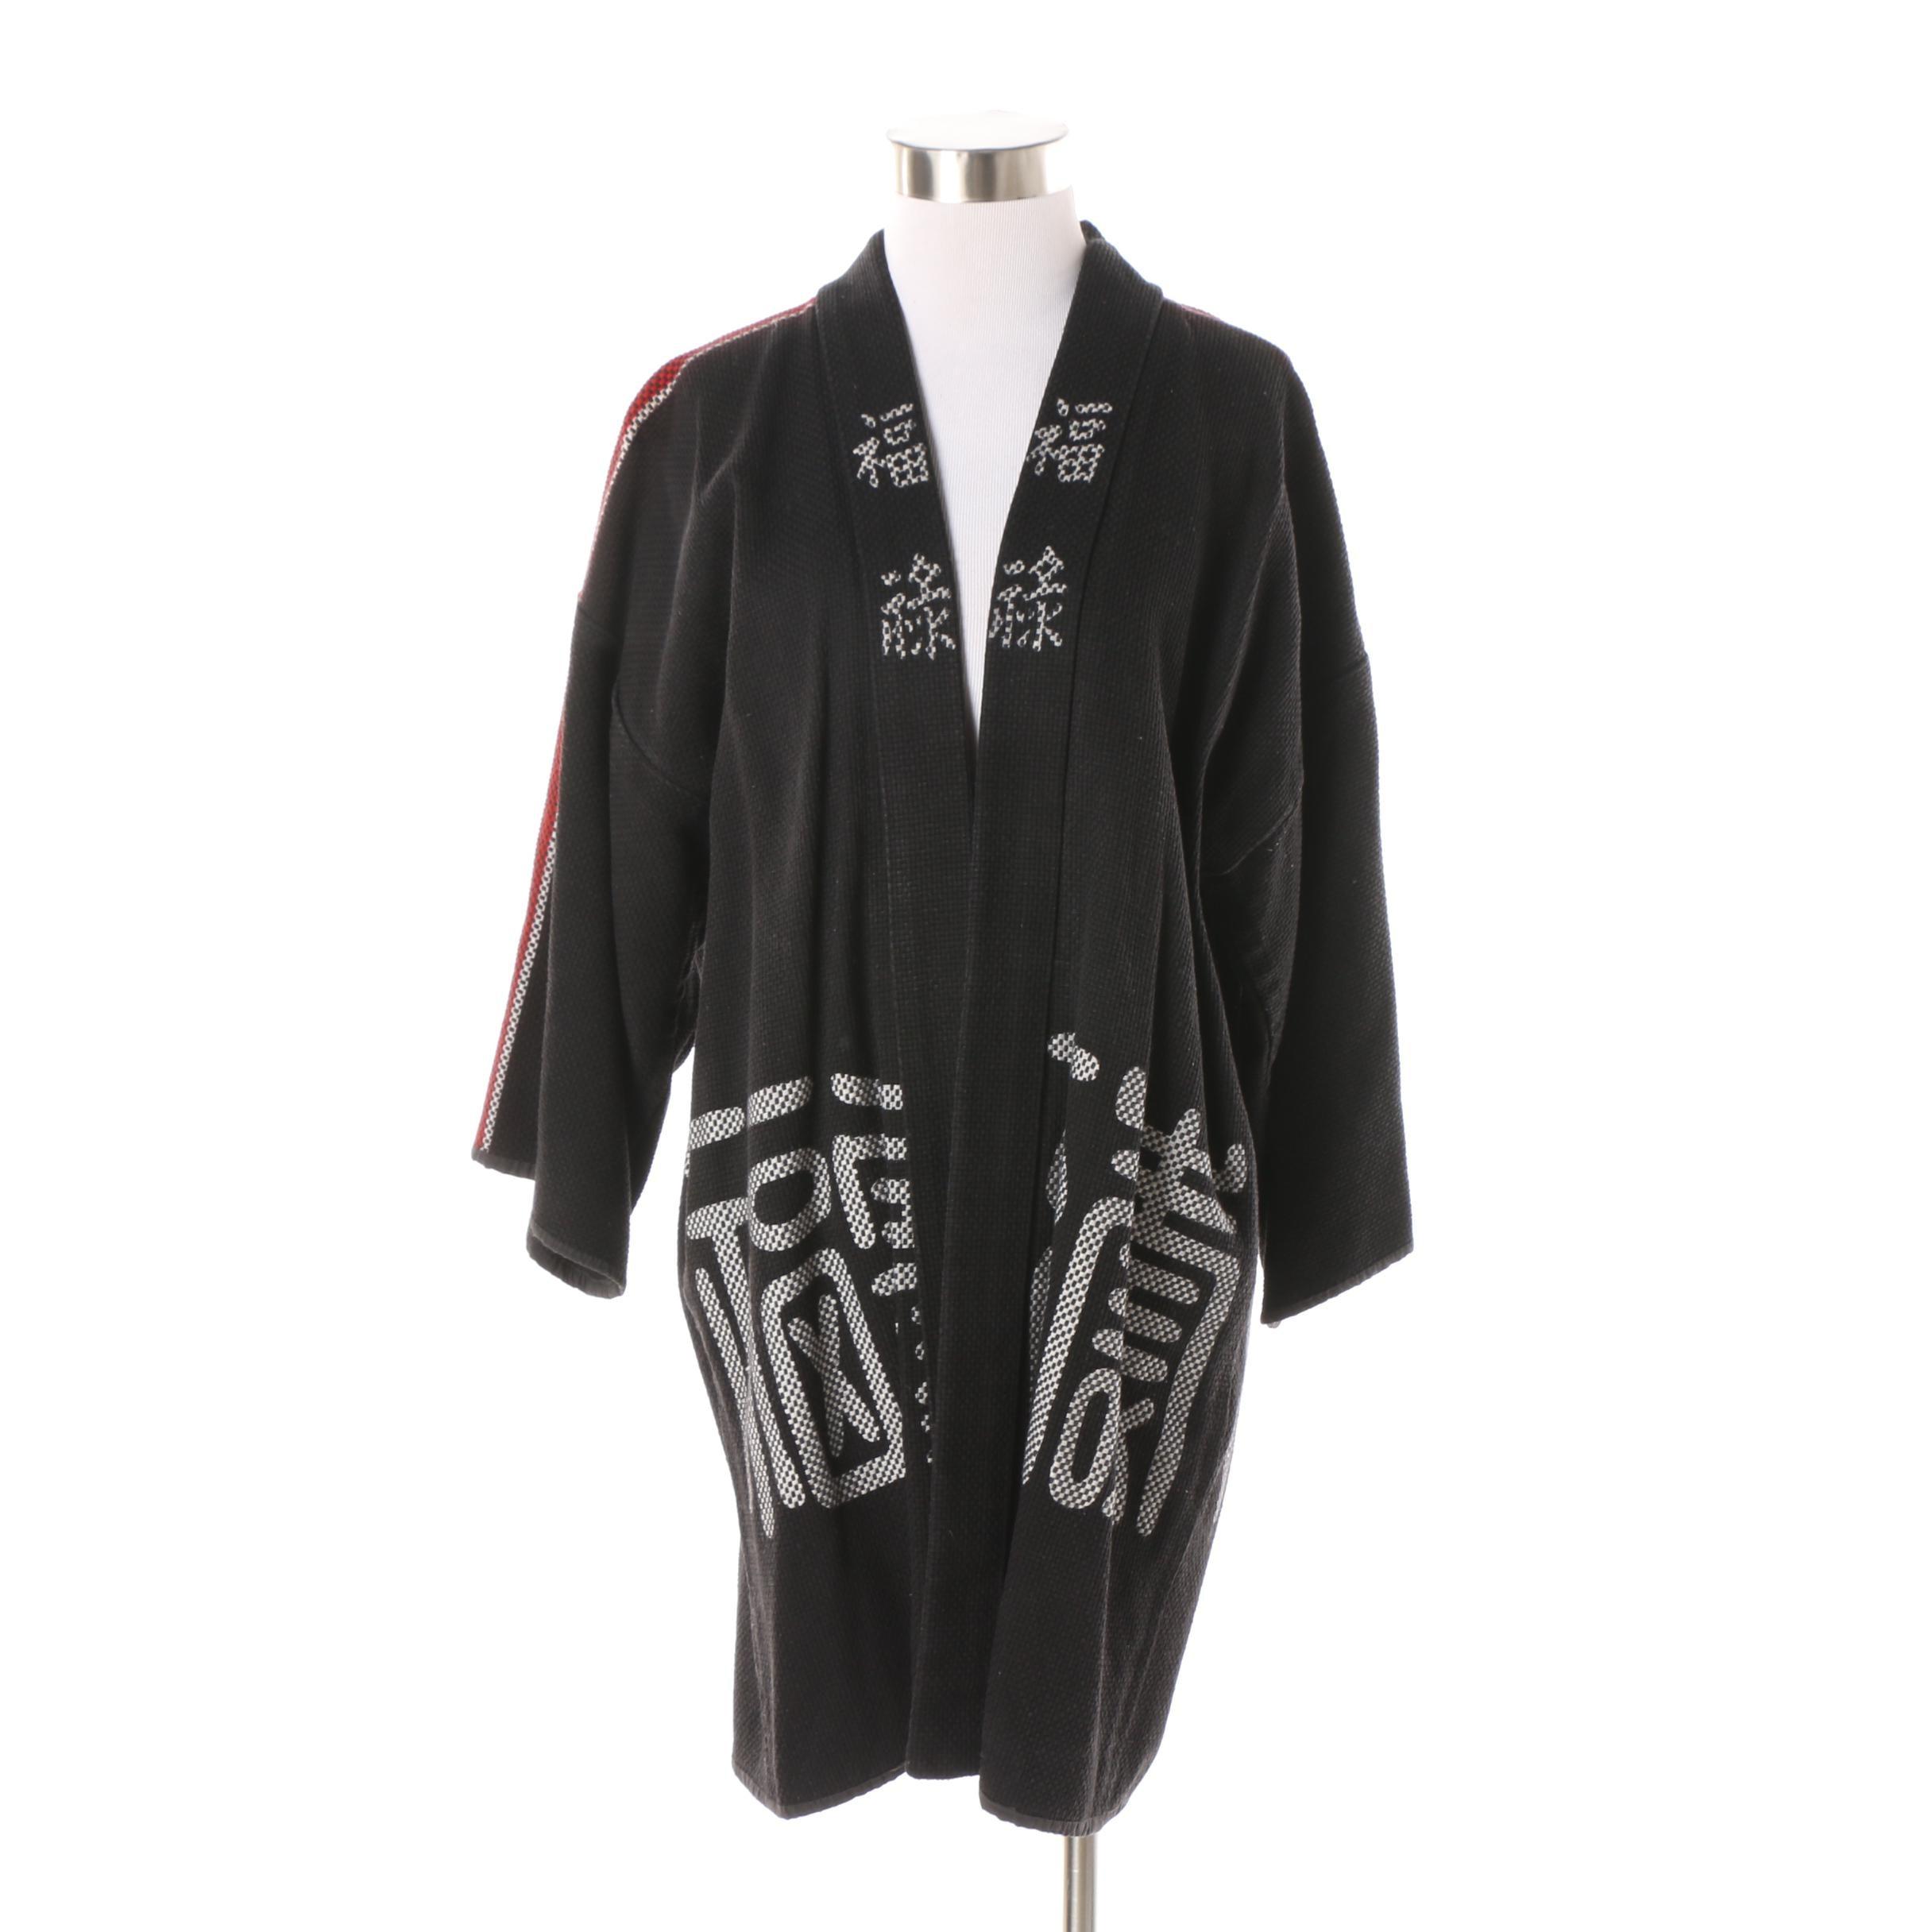 Vintage Japanese Woven Cotton Happi Coat